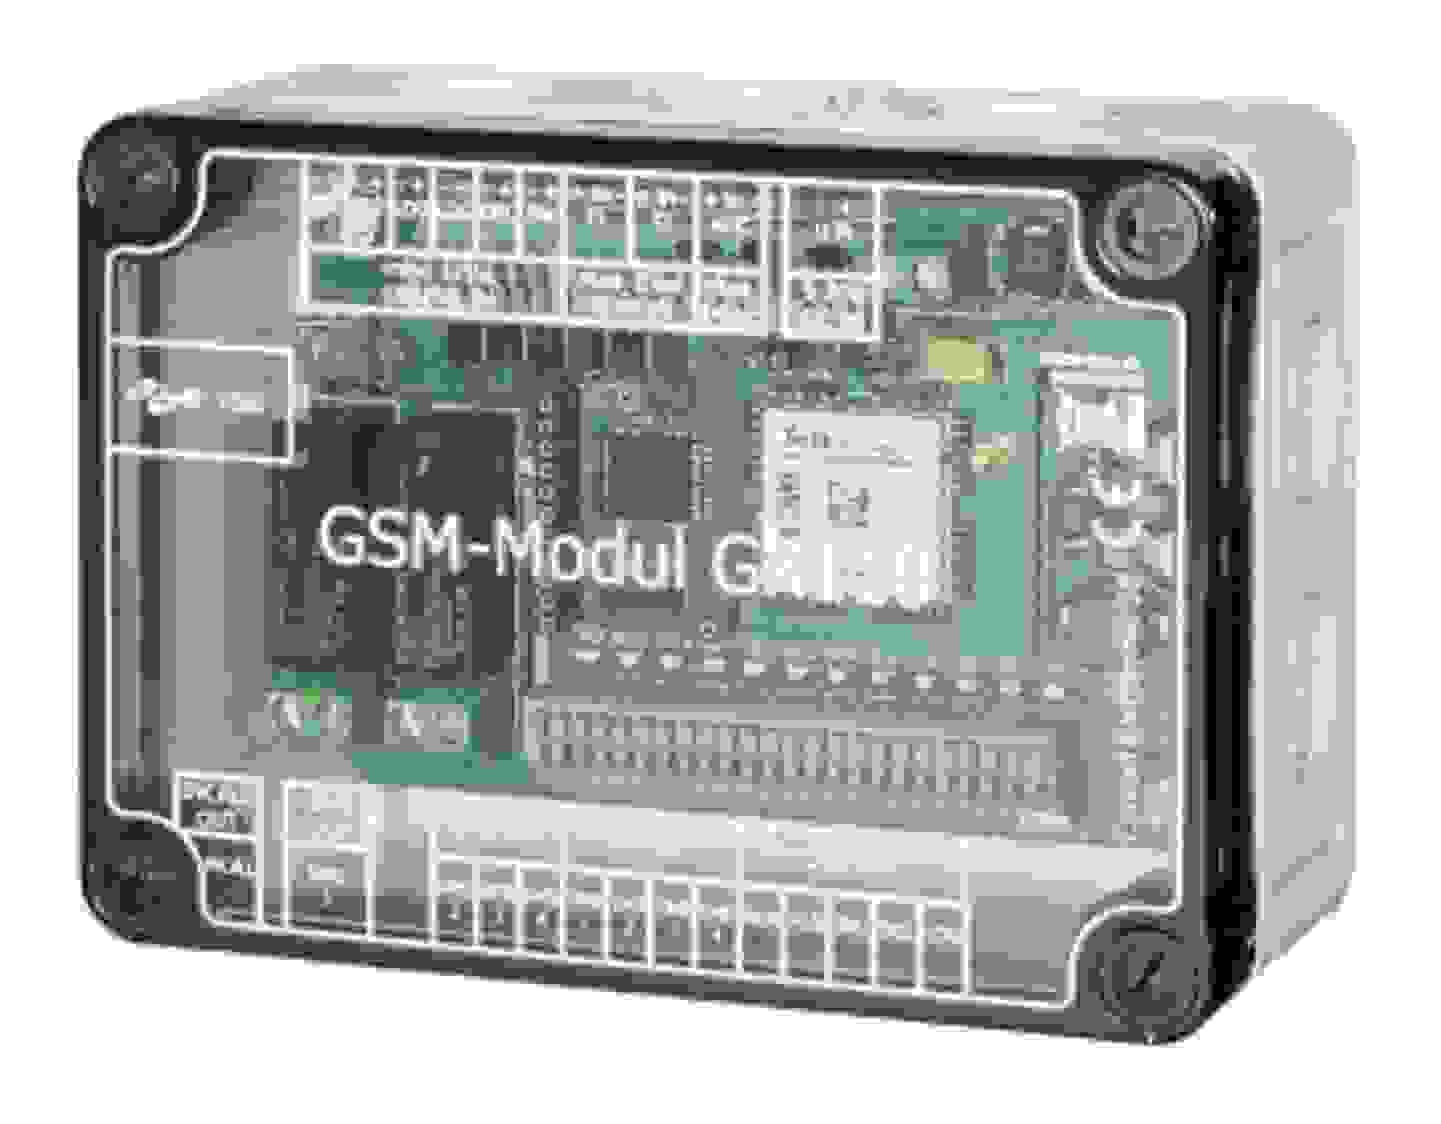 GSM-Modul GX110